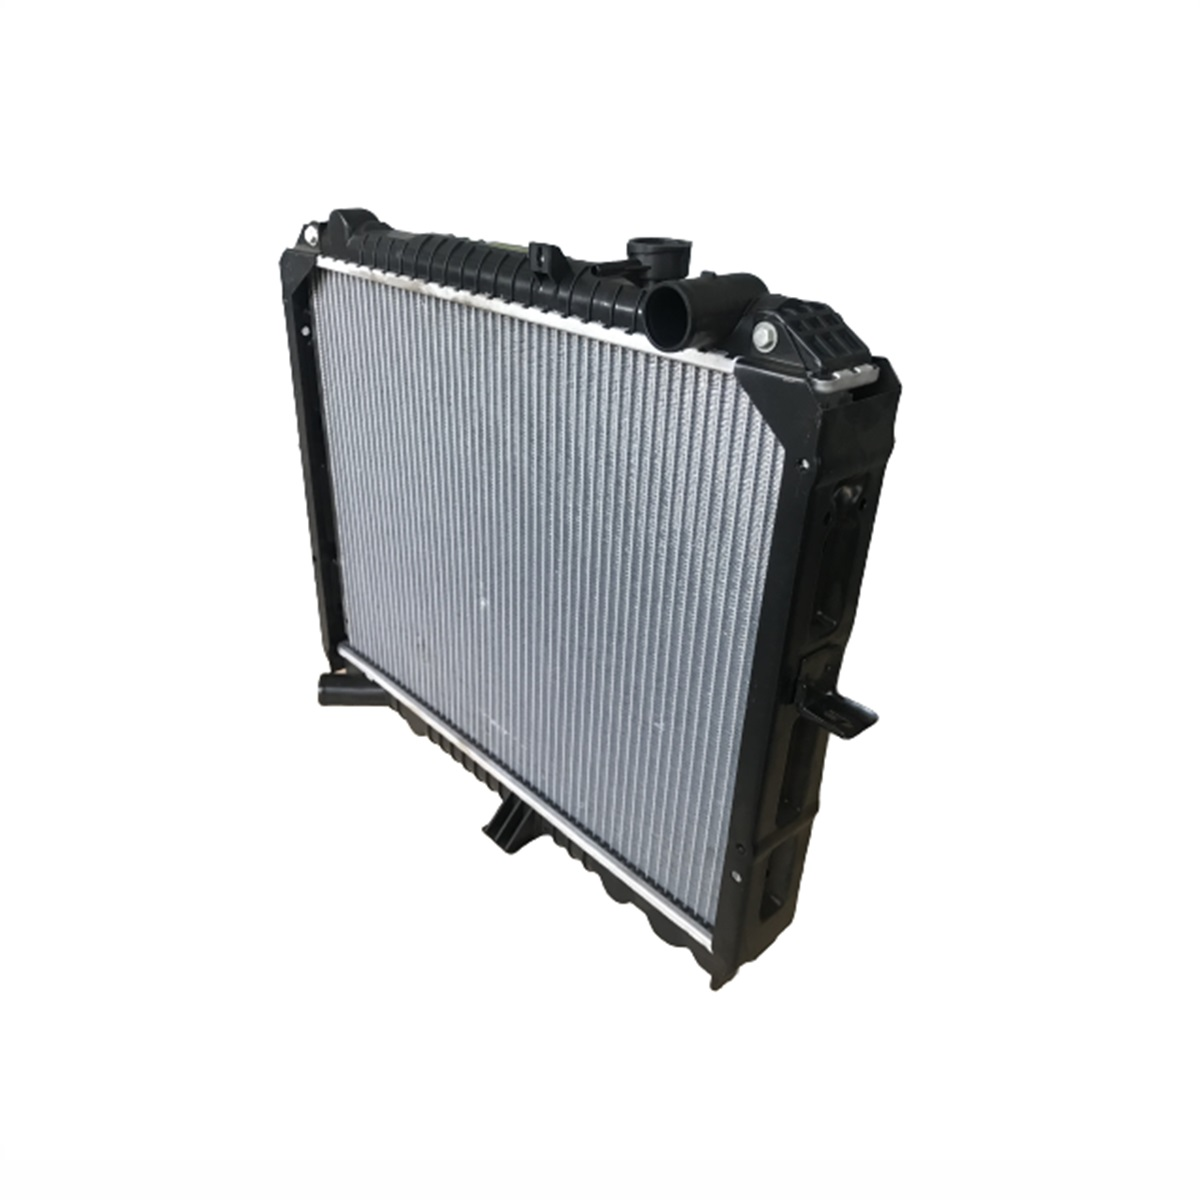 Radiador Kia Bongo 2.7 Diesel Com Ar / Sem Ar Manual 2005 a 2011